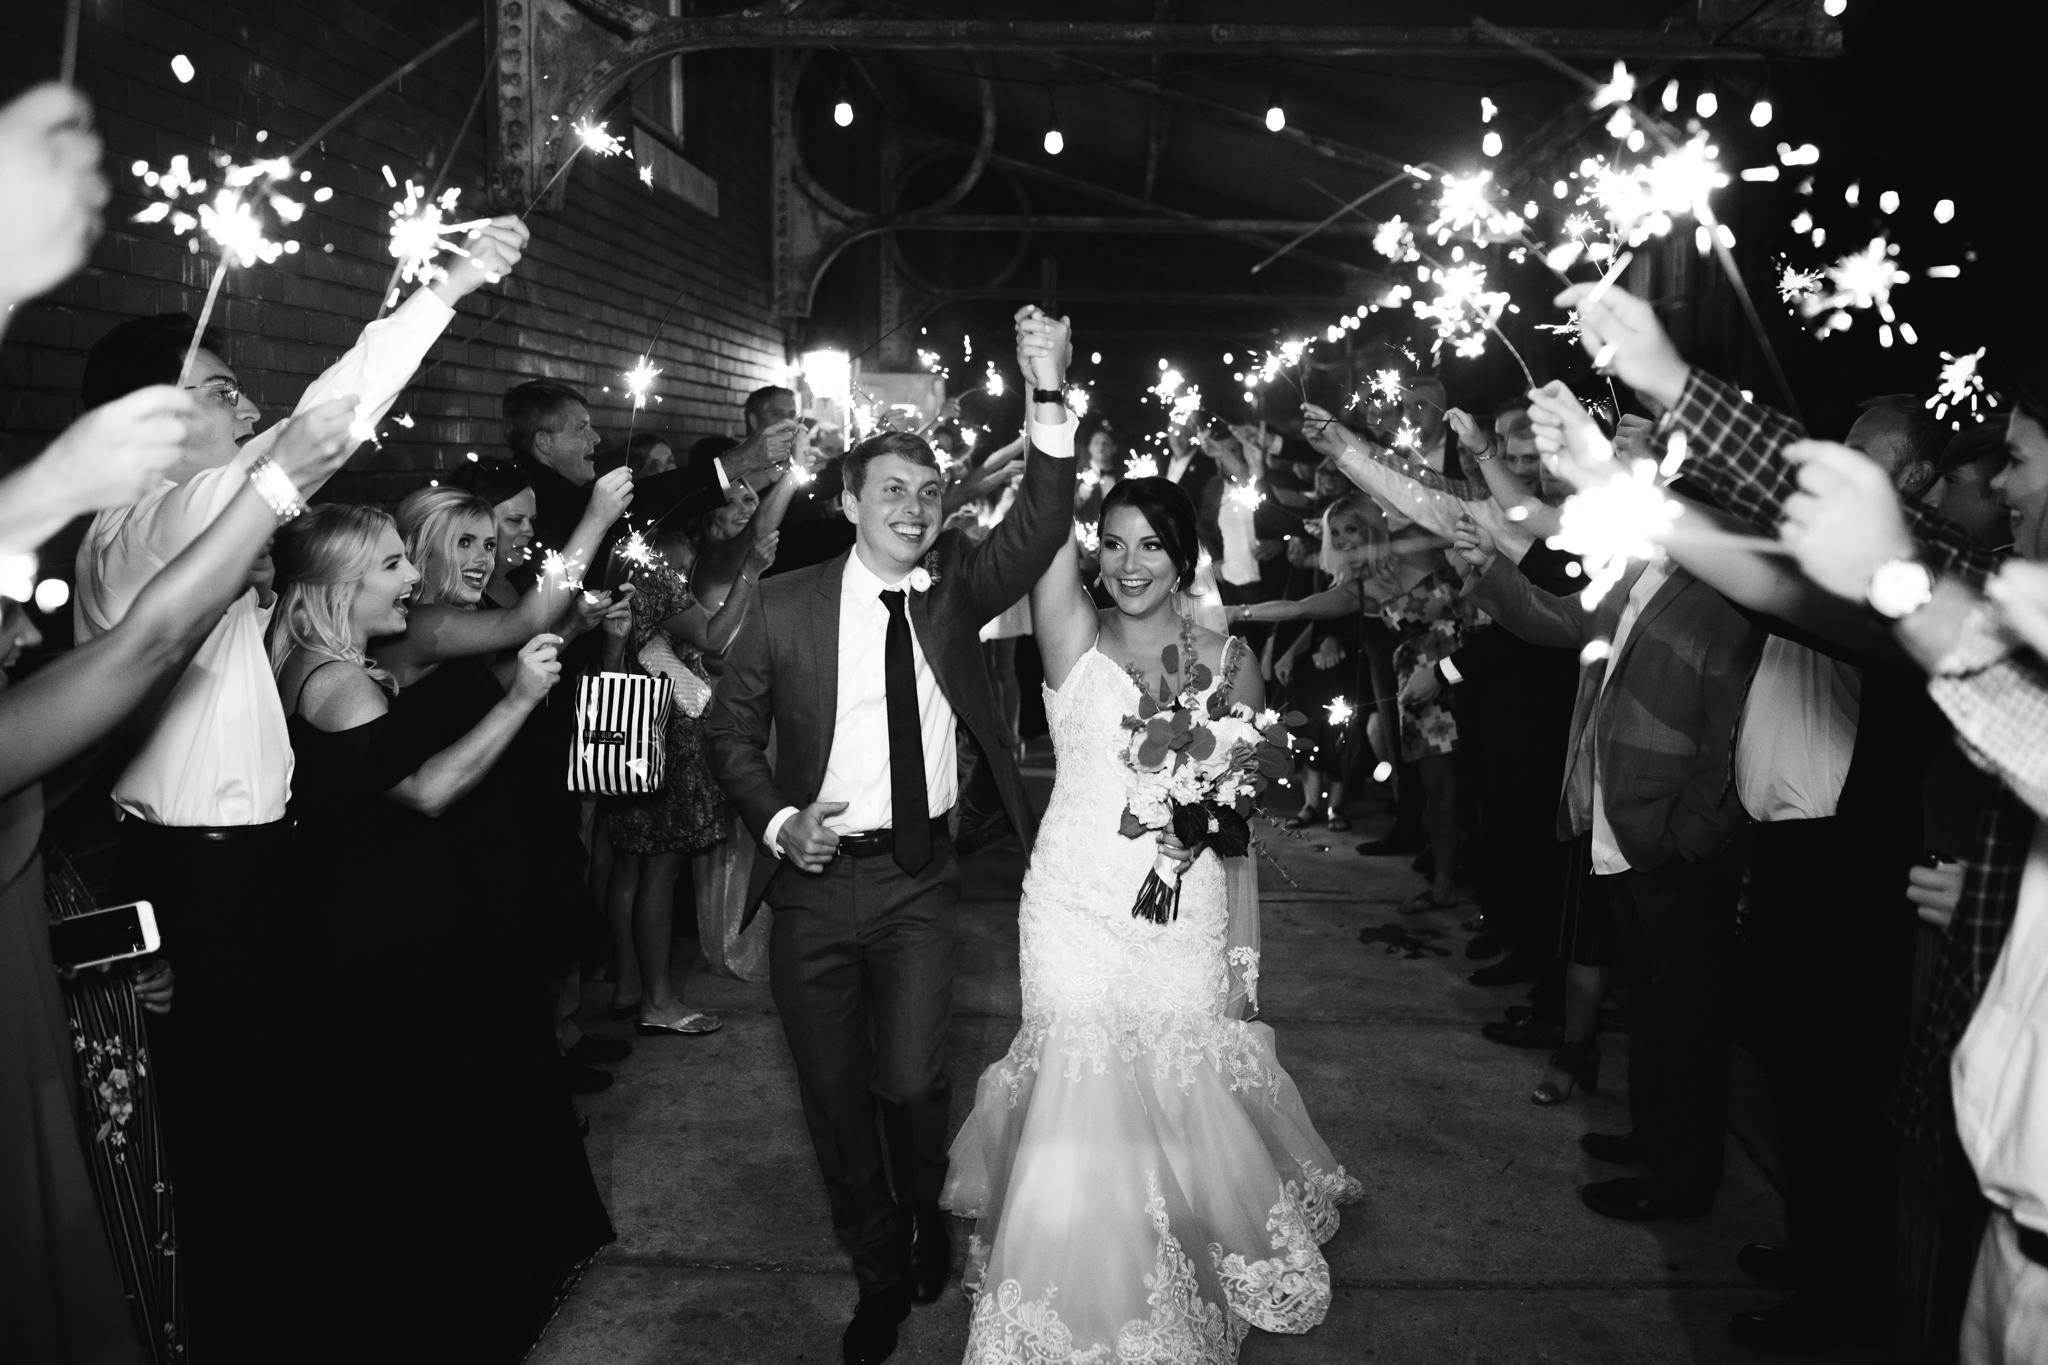 409smain-downtown-memphis-wedding-venue-thewarmtharoundyou (243 of 243).jpg